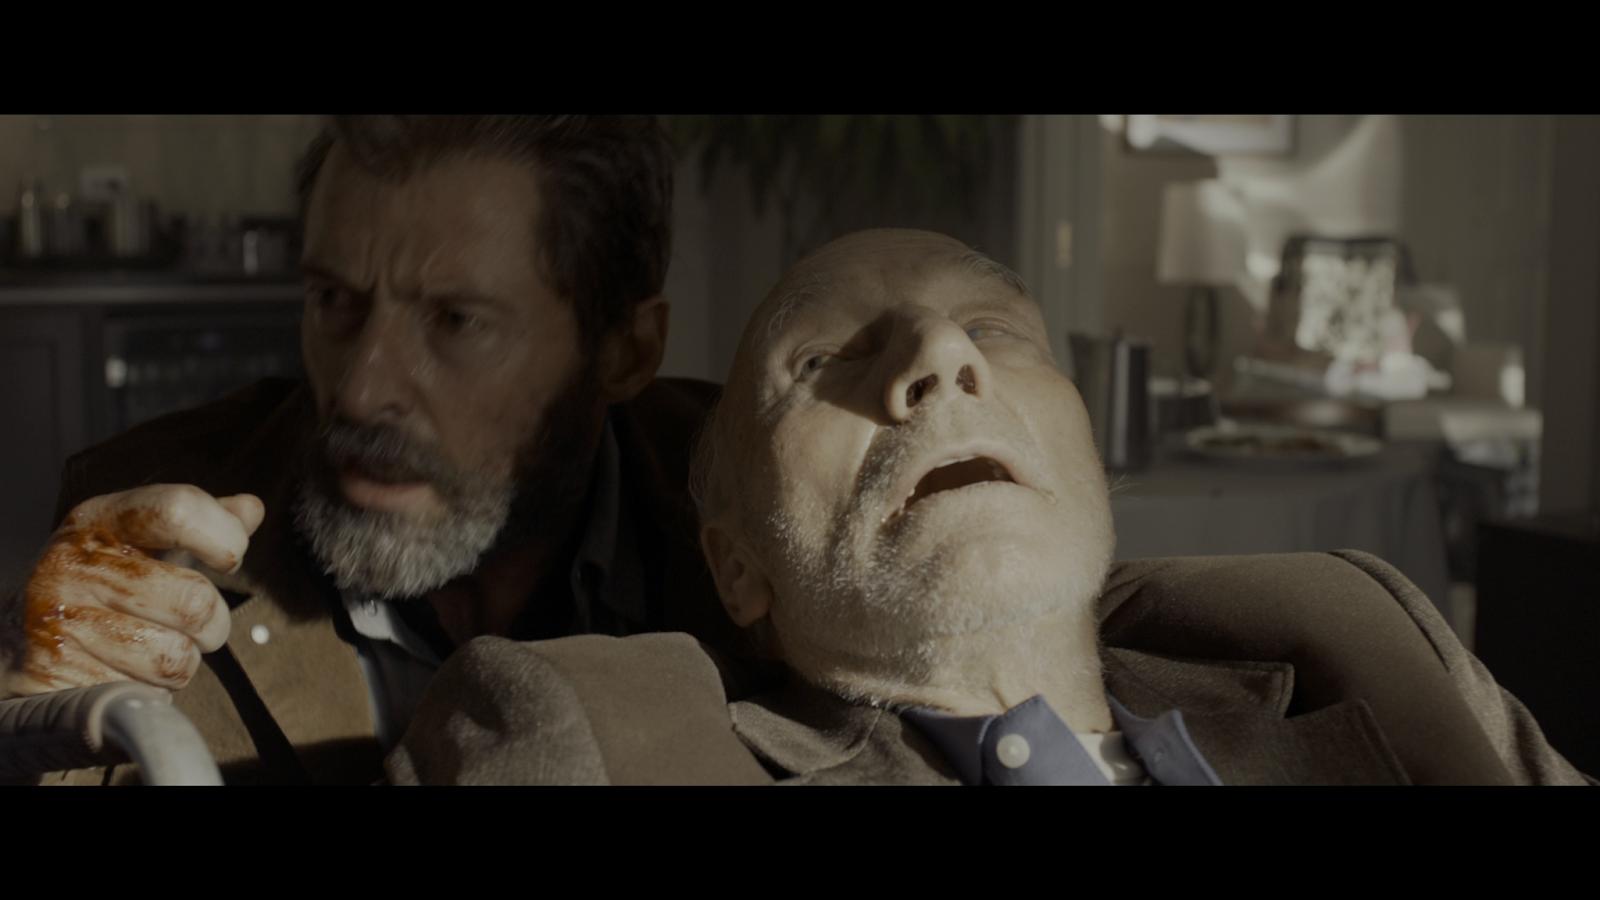 Logan: Wolverine (2017) 4K UHD Blu-Ray Completo captura 2